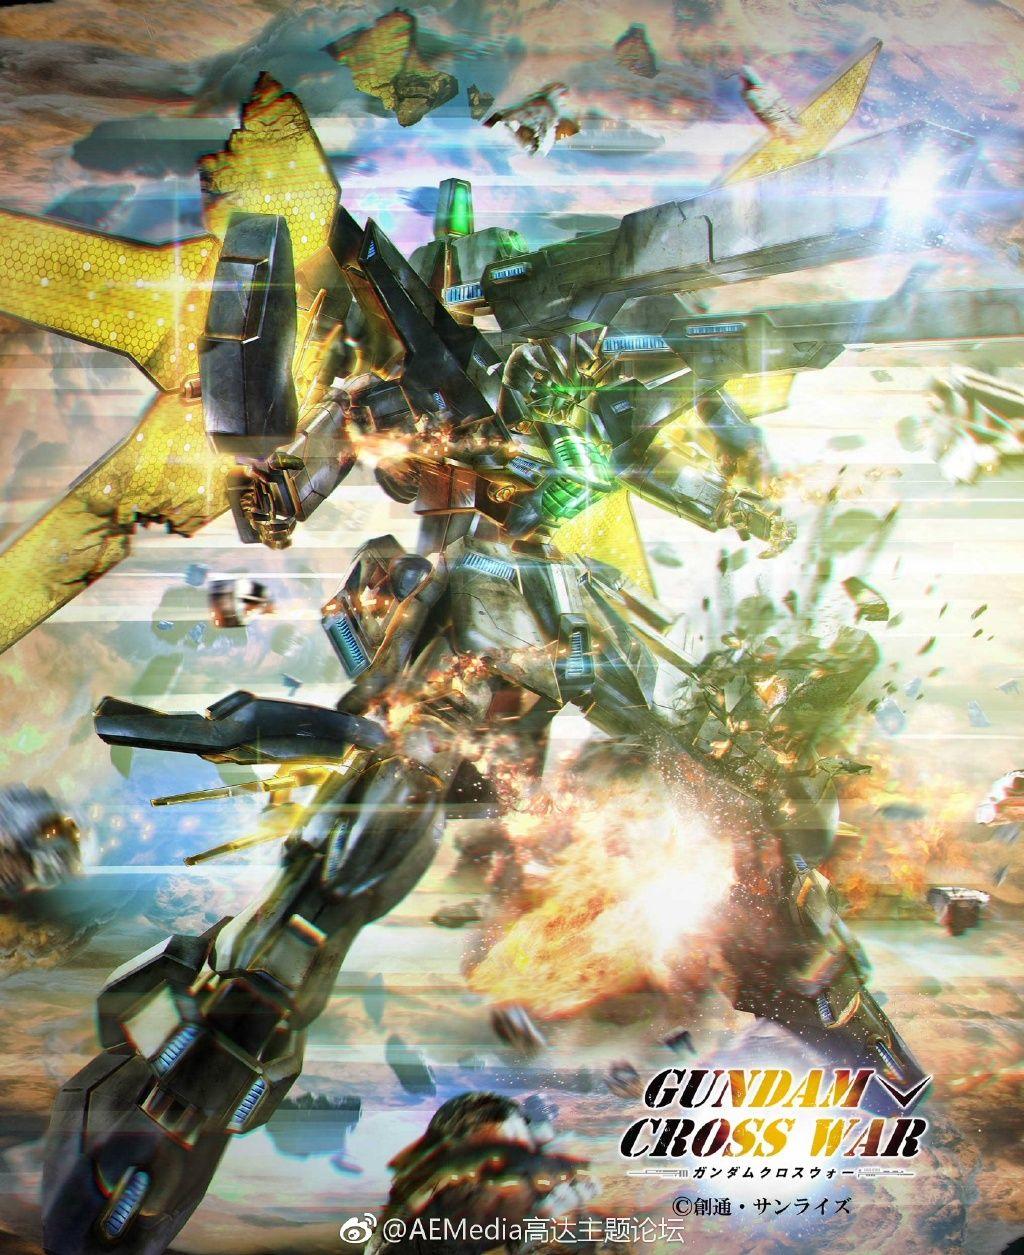 Gundam Cross War Mobile Phone Size Wallpapers(画像あり) ガンダム